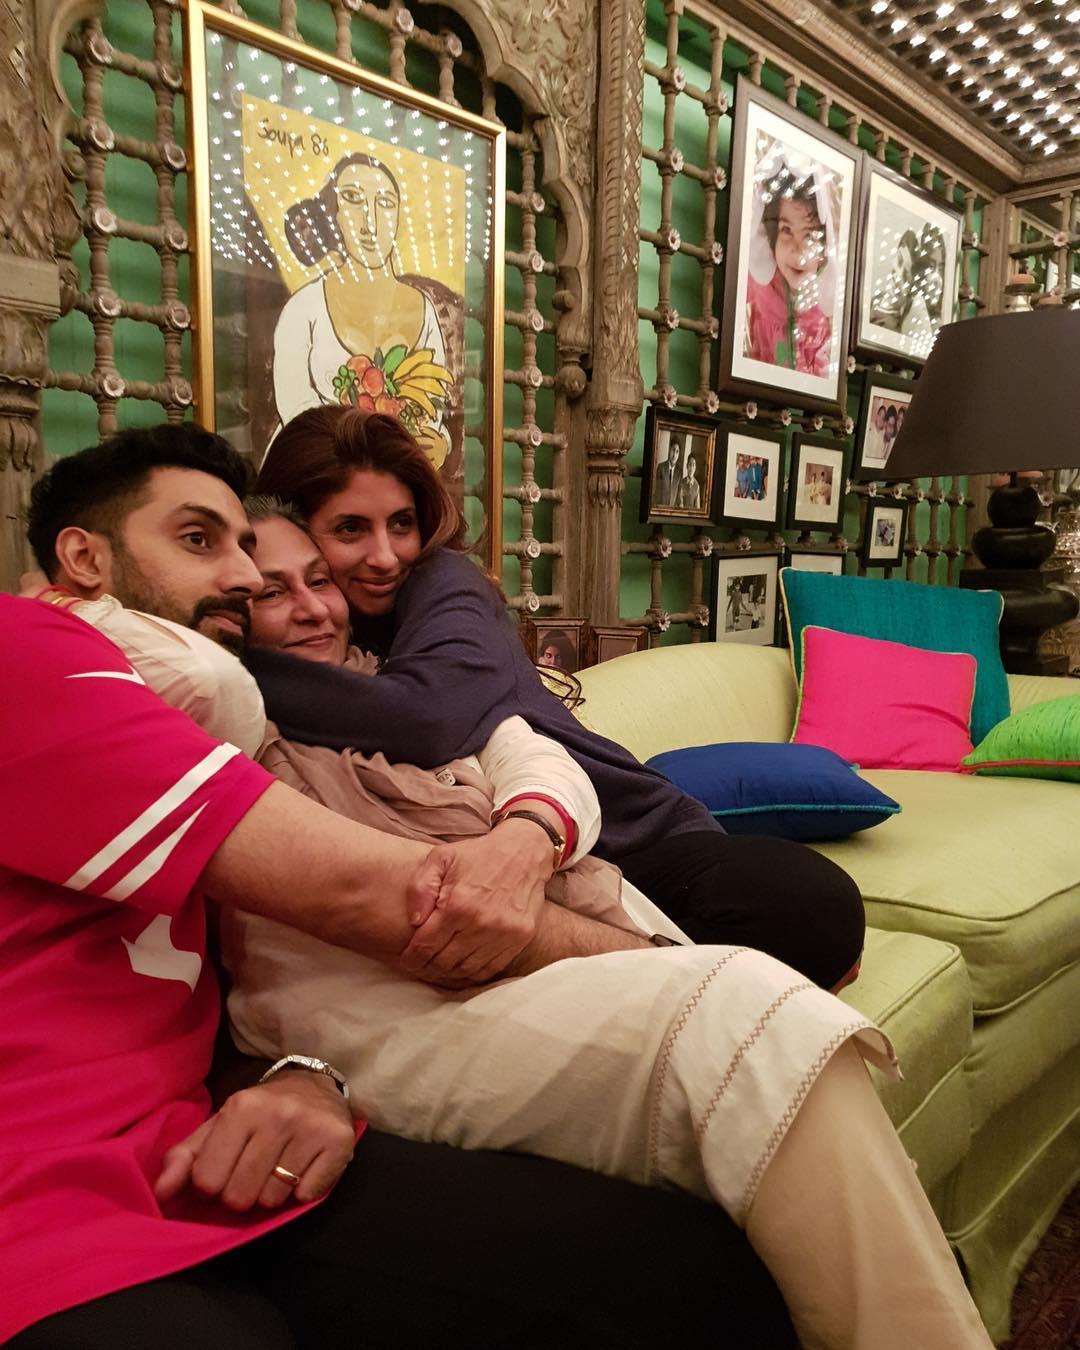 Abhishek Bachchan, Jaya Bachchan and Shweta Bachchan at their home Jalsa.